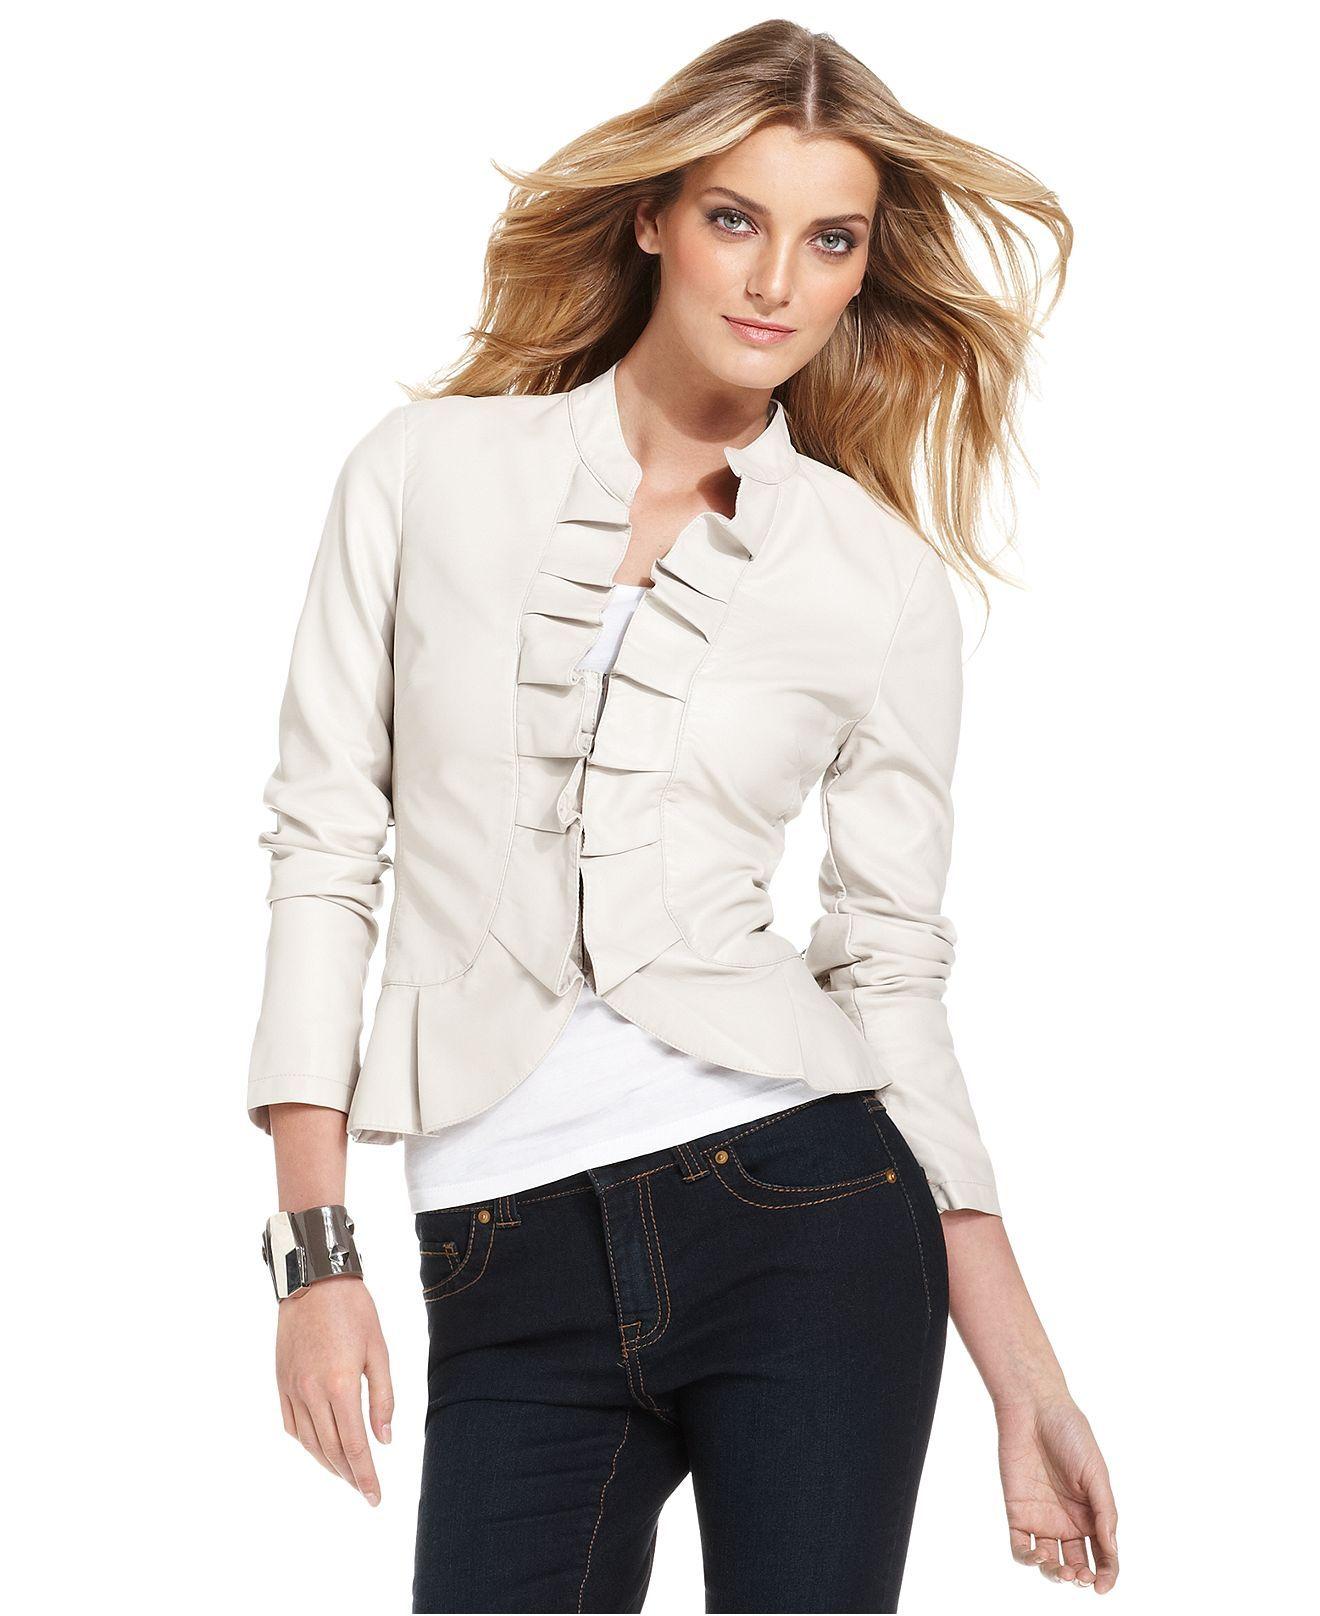 INC International Concepts Jacket, FauxLeather Ruffle